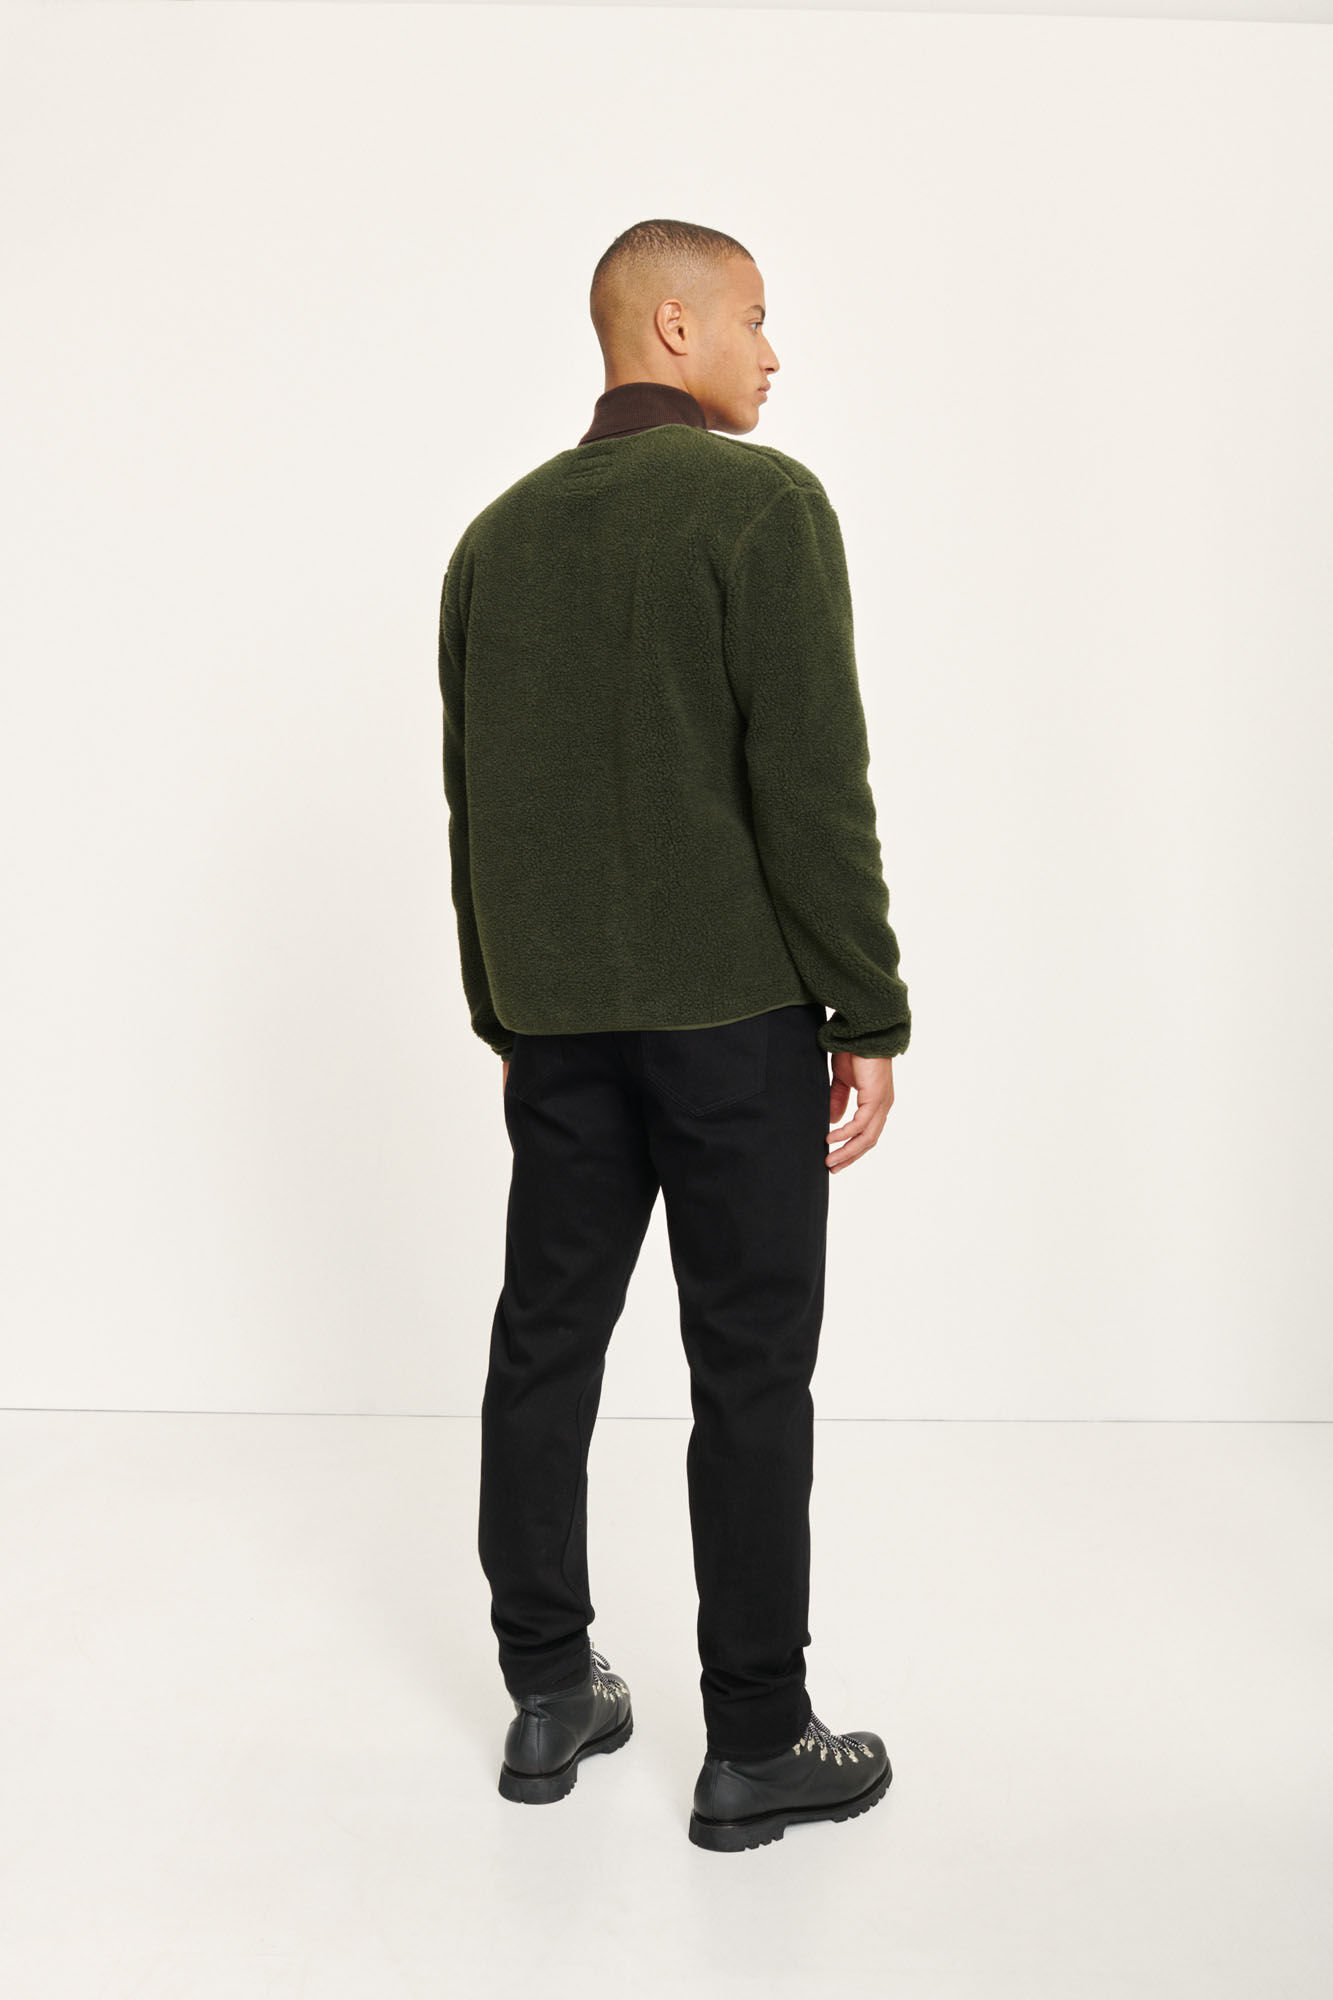 Cosmo jeans 13047, TRUE BLACK